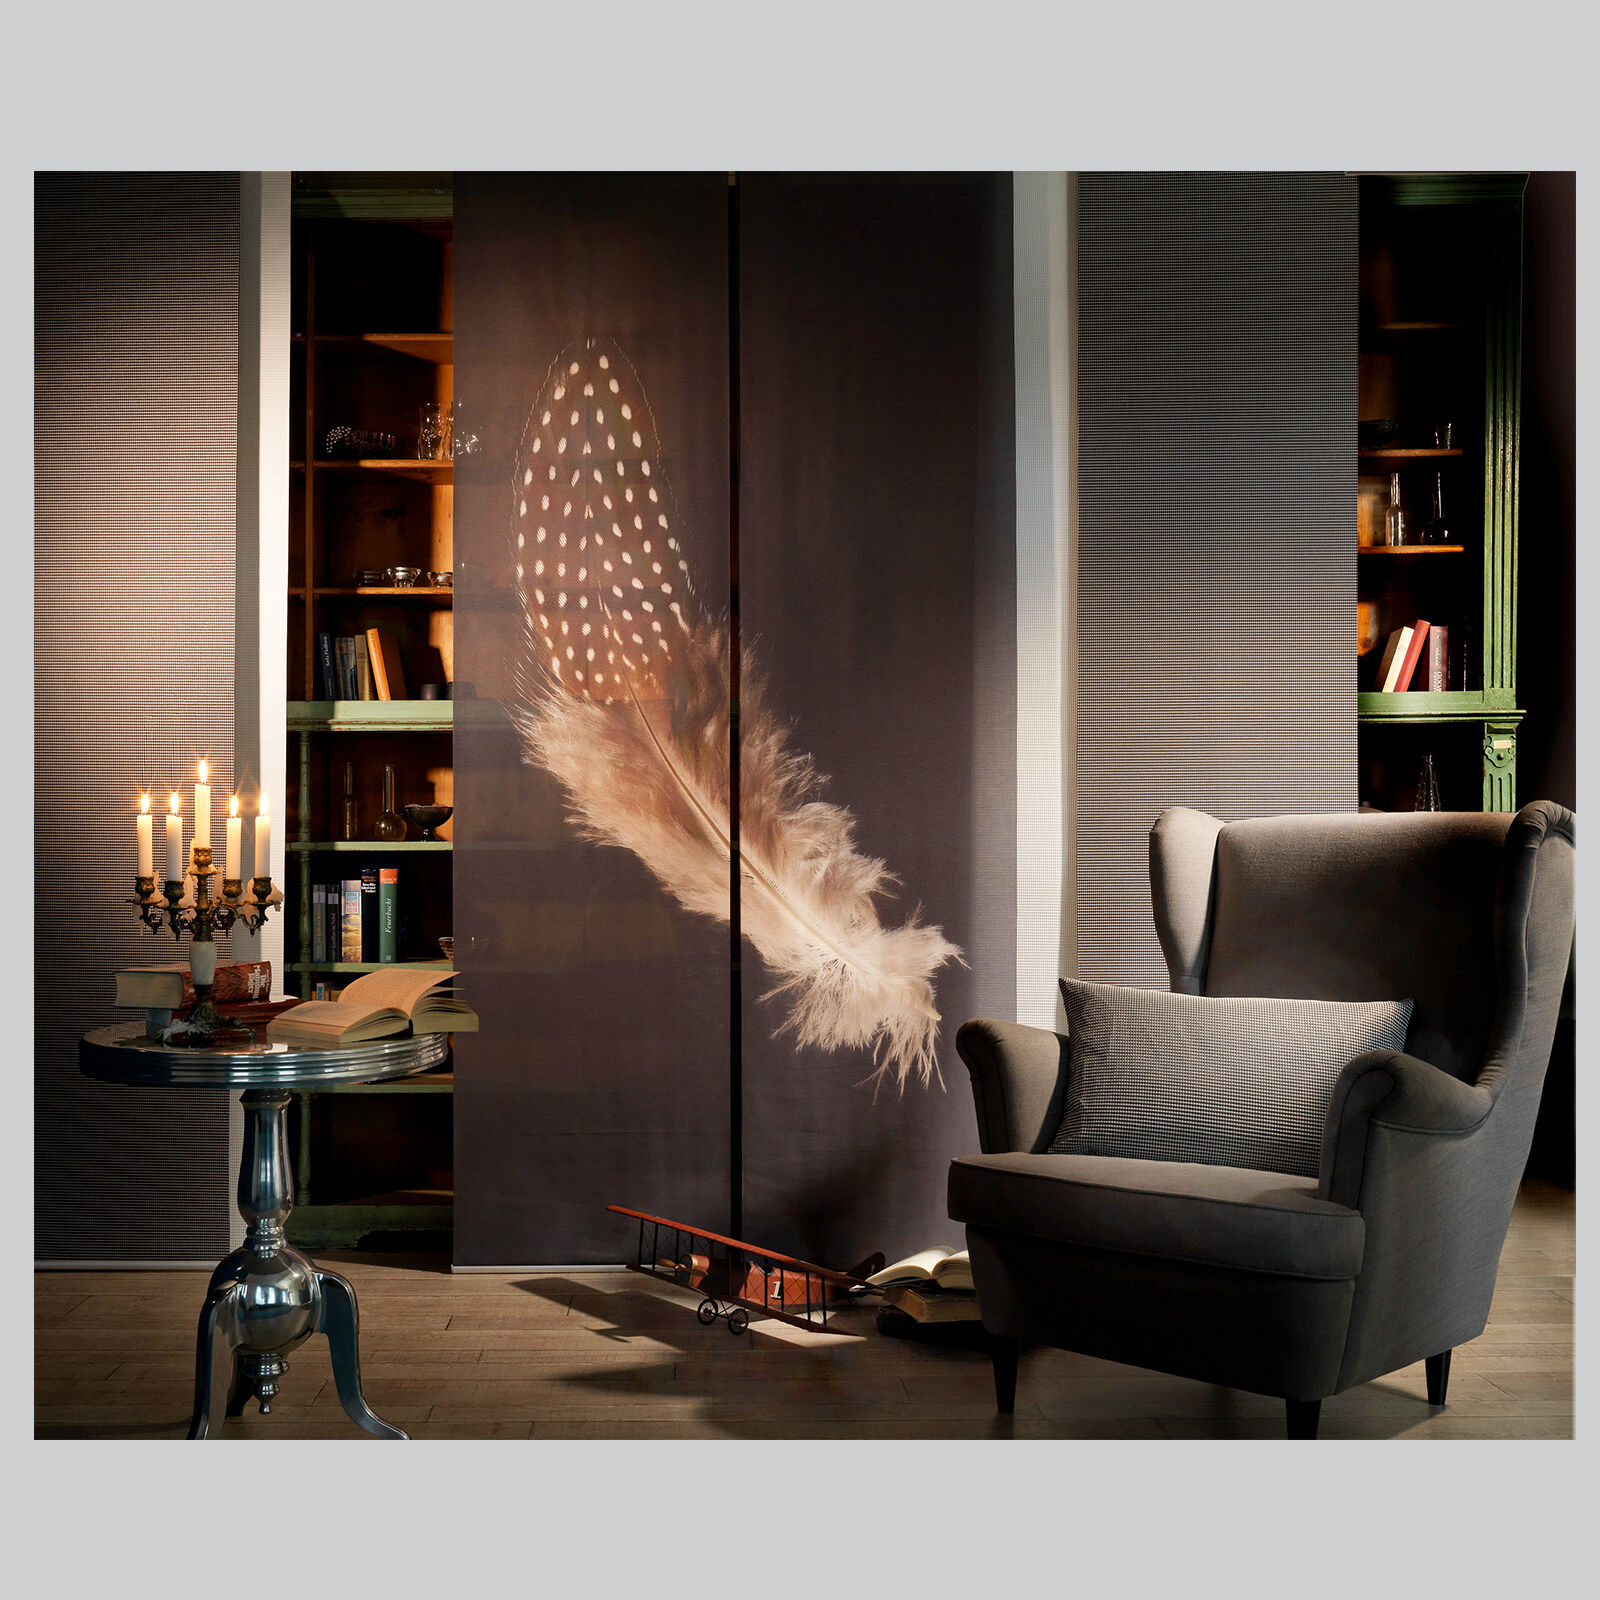 Feder foto schiebevorhang raumteiler paneele for Raumteiler schiebevorhang